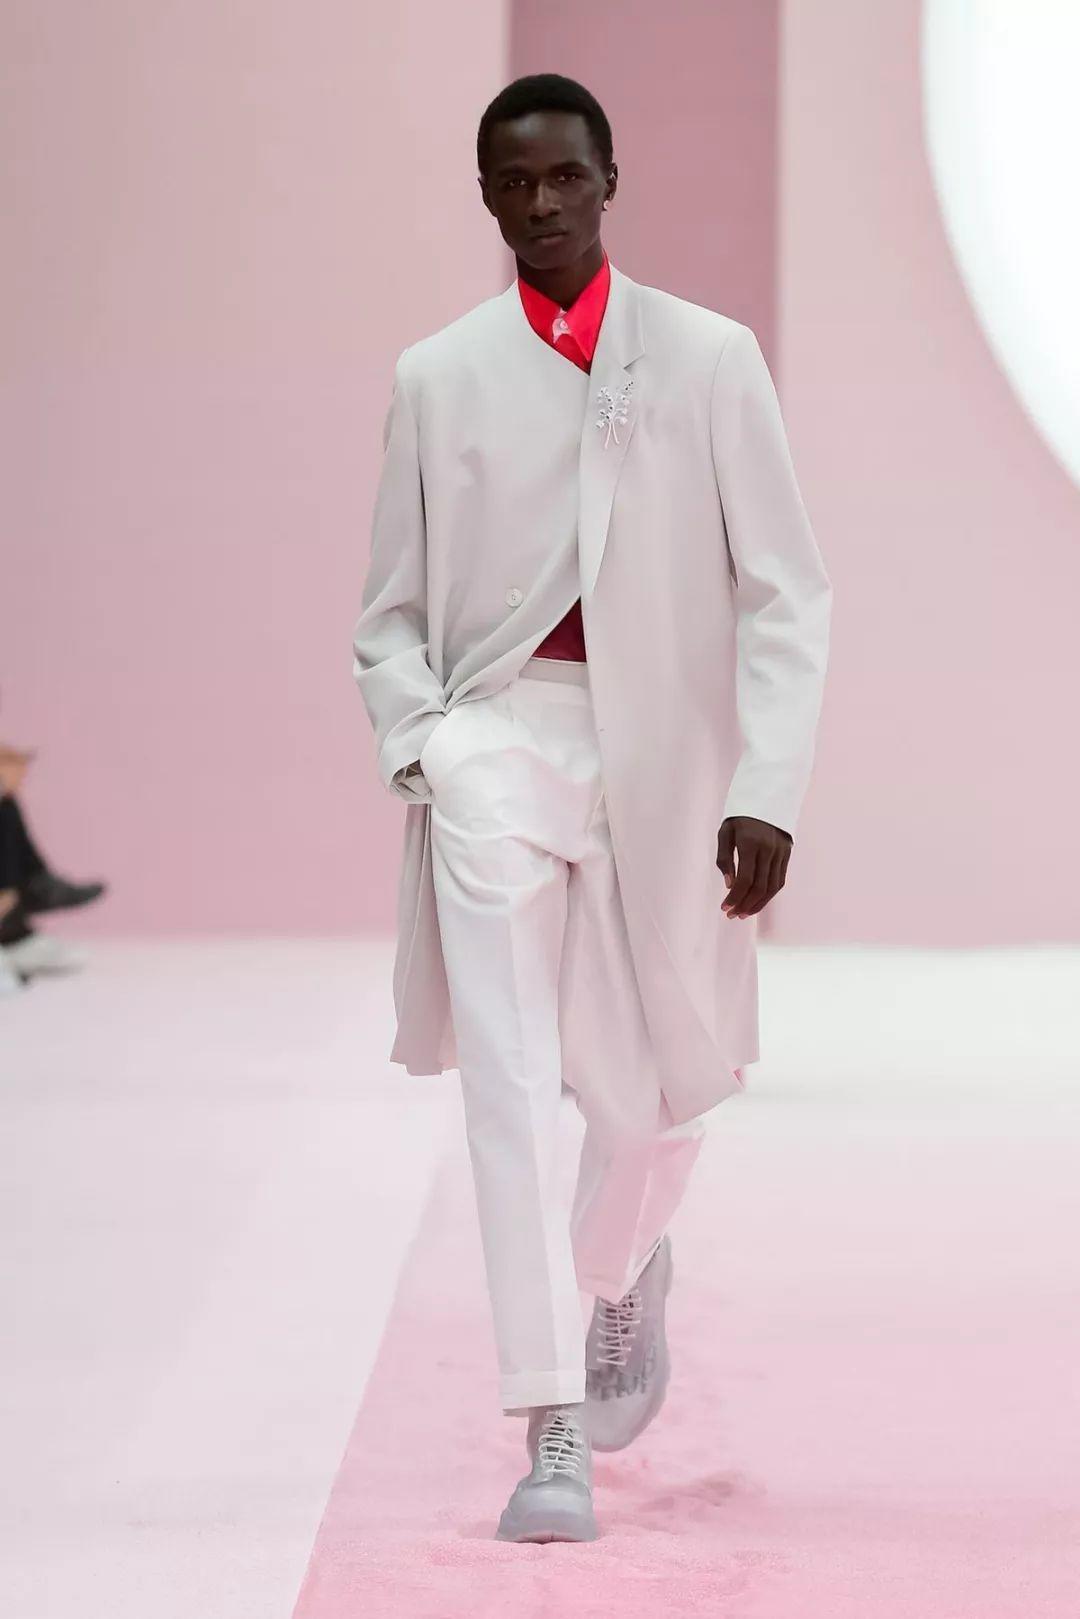 Dior迪奥 x Daniel Arsham重磅联名单品曝光,下月将开启发售!